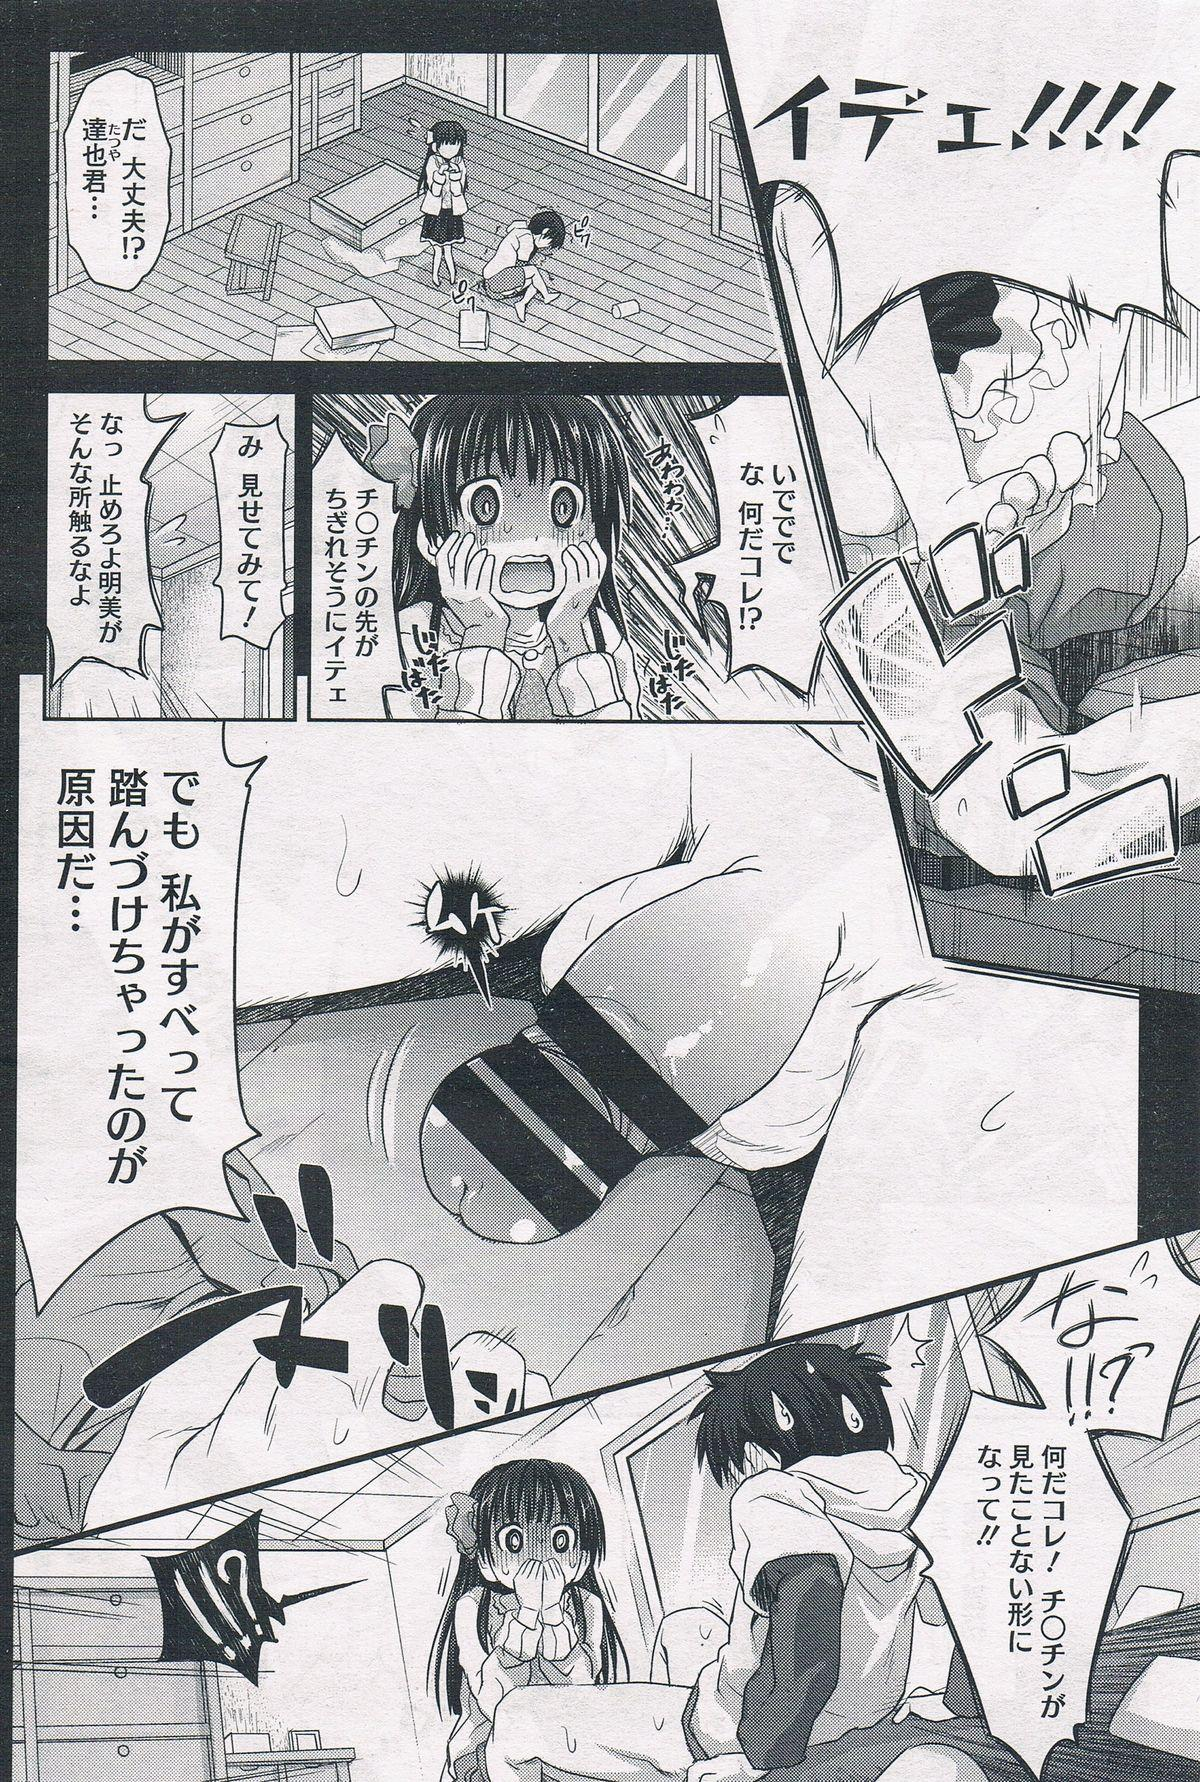 Migite no koibito COMIC Megastore 2012-07 3